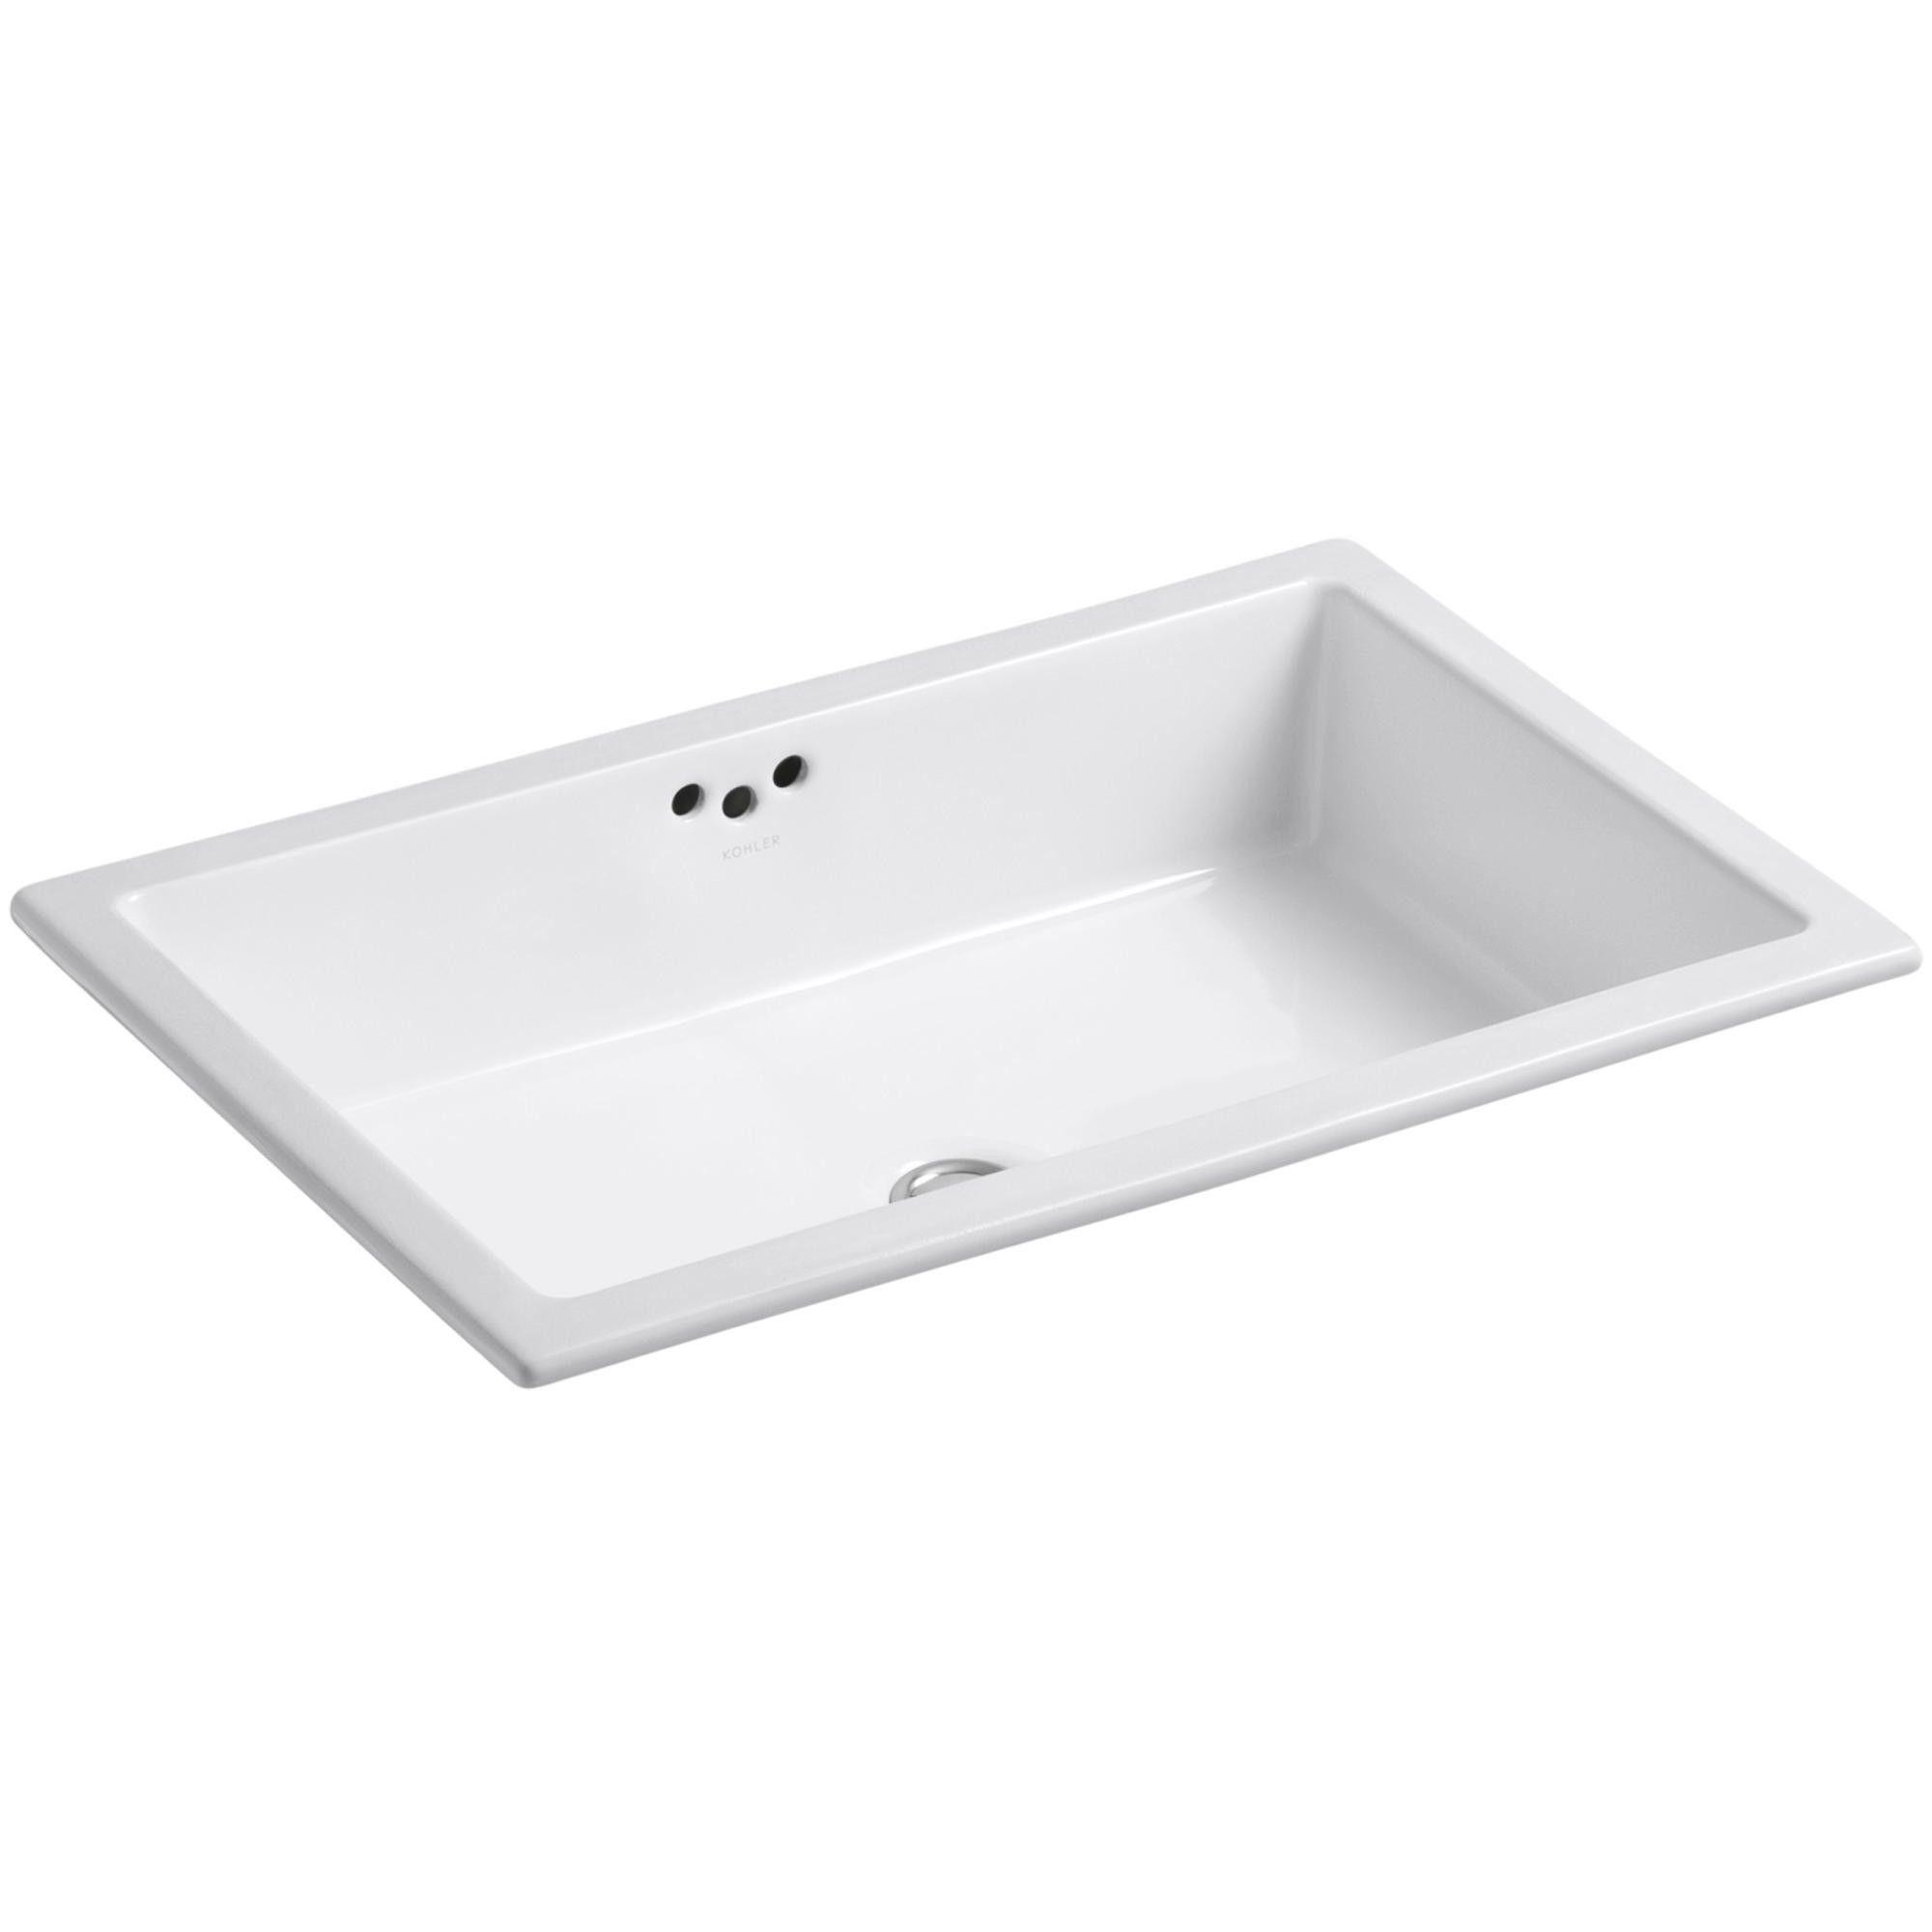 Kohler K 2297 G Kathryn 21 Undermount Bathroom Sink With Overflow